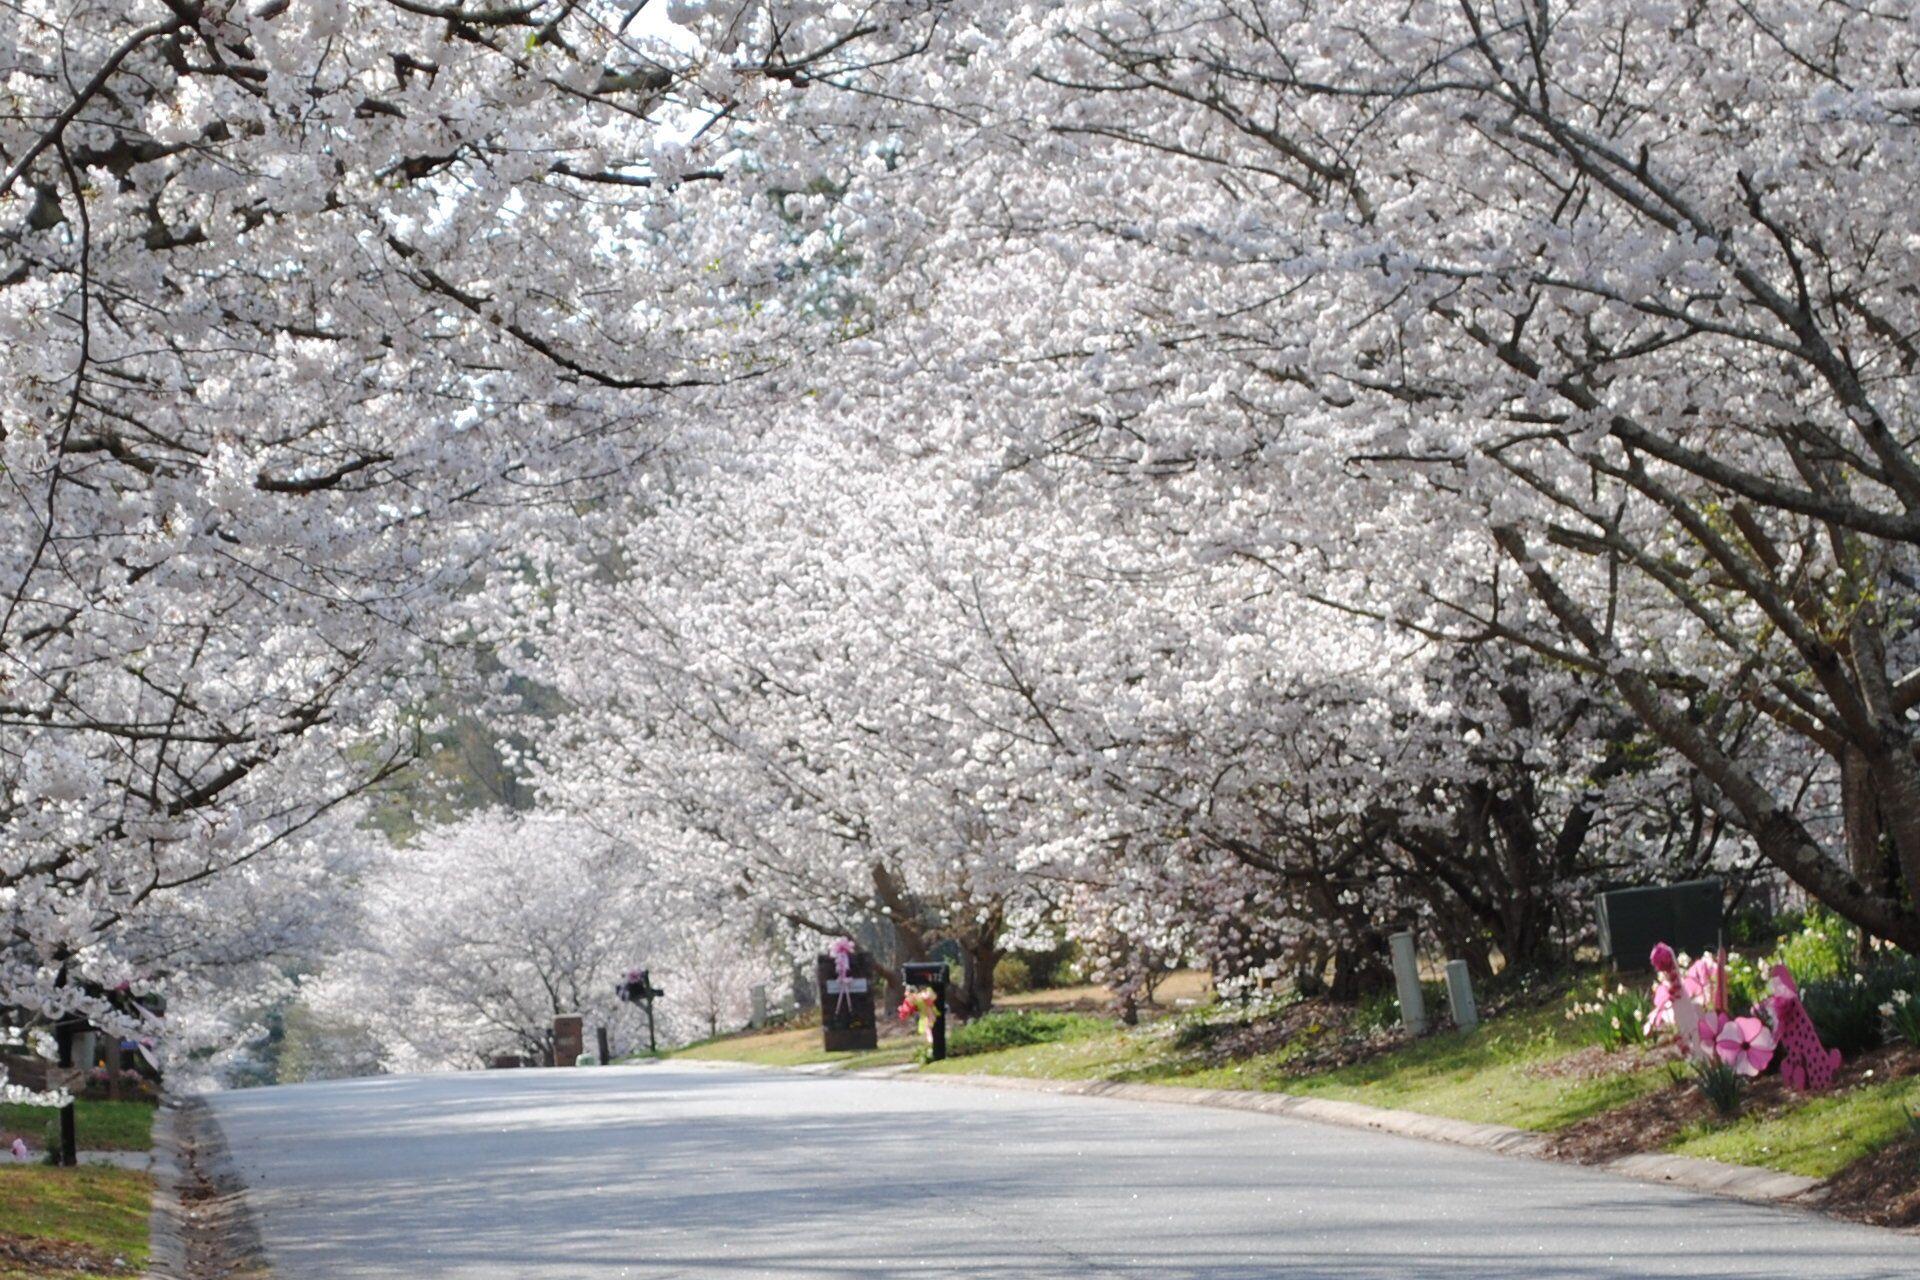 Cherry Blossom Festival Macon Ga Usa Yoshino Cherry Tree Cherry Blossom Festival Macon